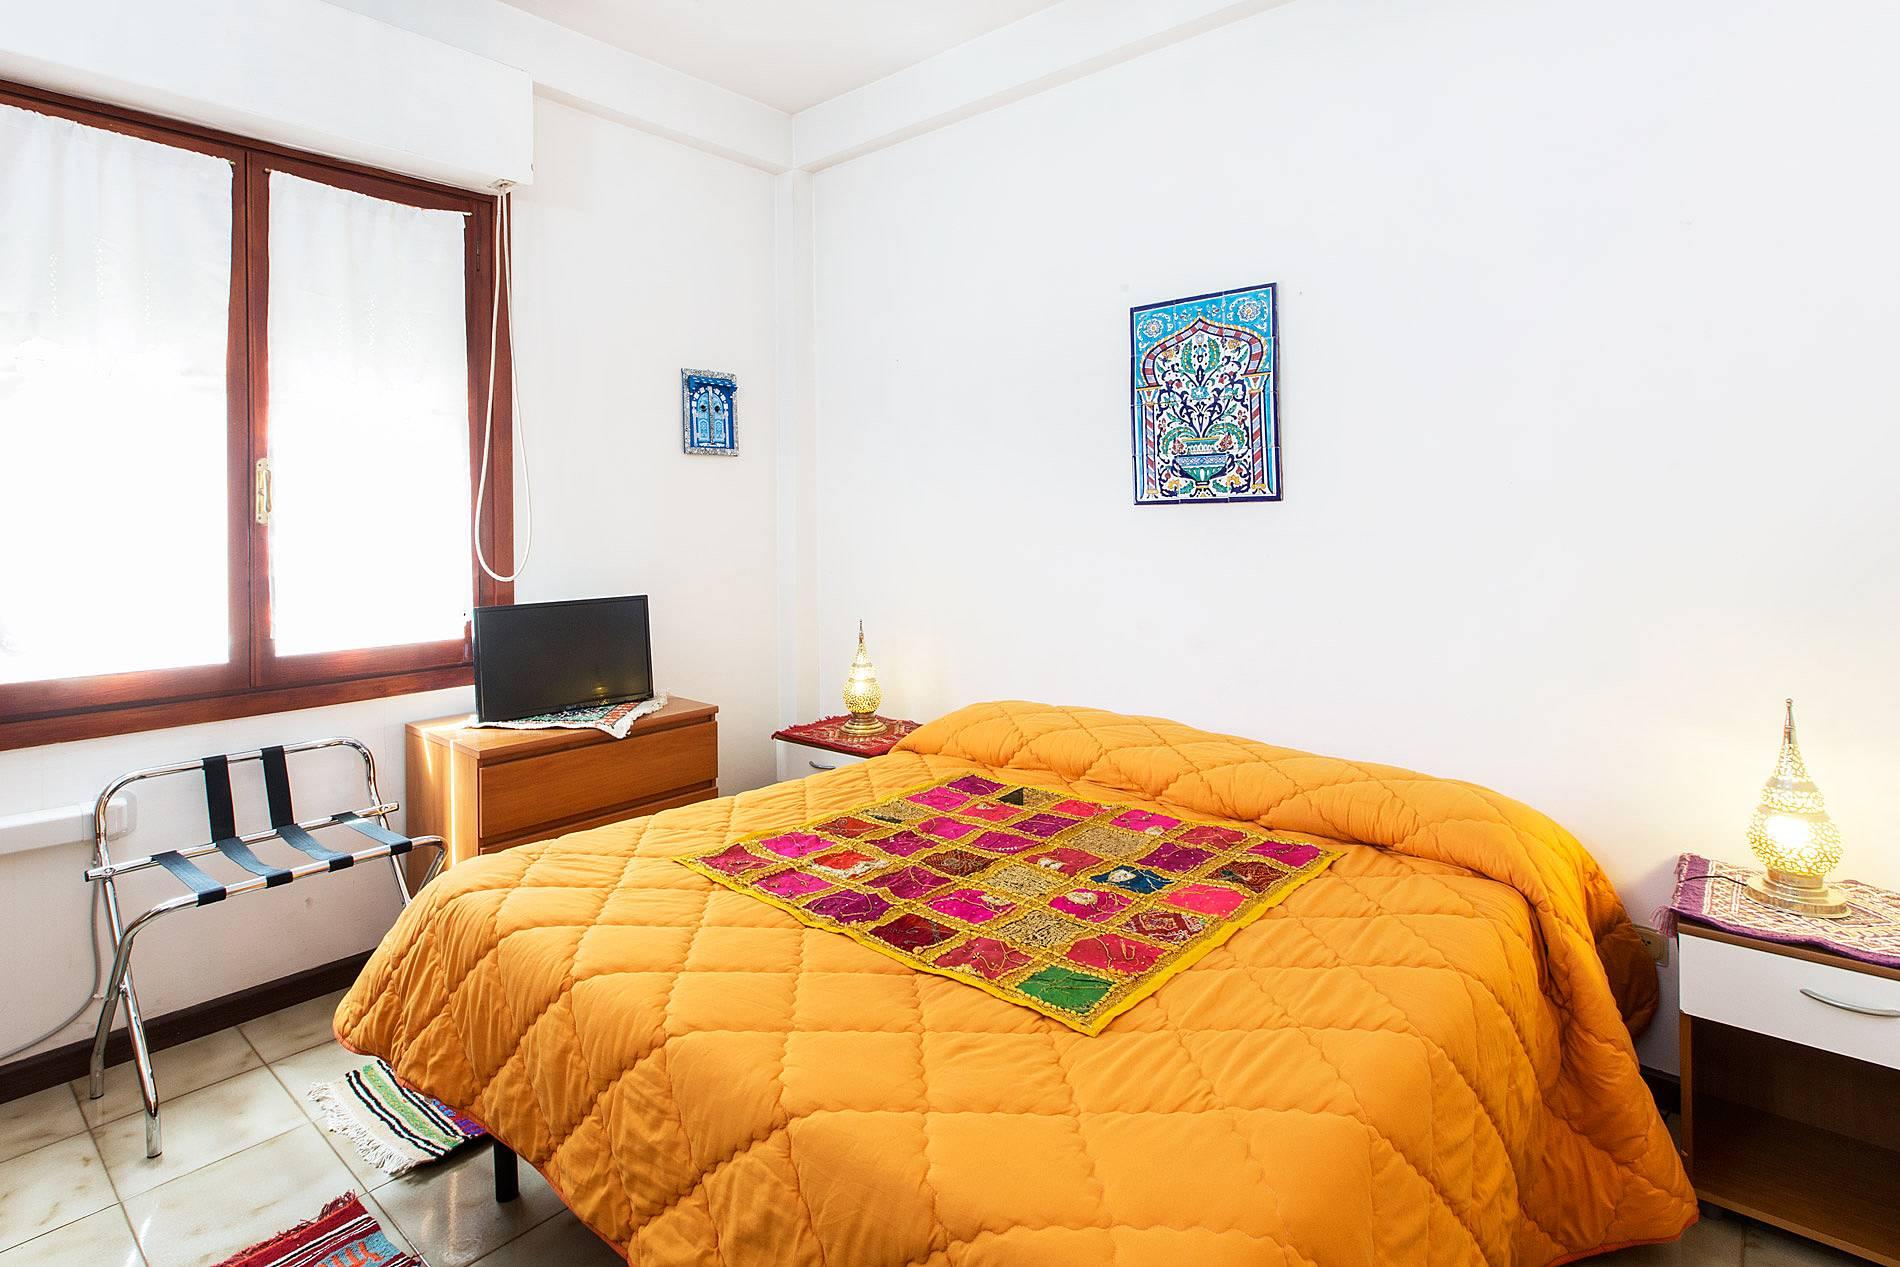 Appartamenti vacanze cagliari appartamenti in affitto for Appartamenti arredati in affitto cagliari